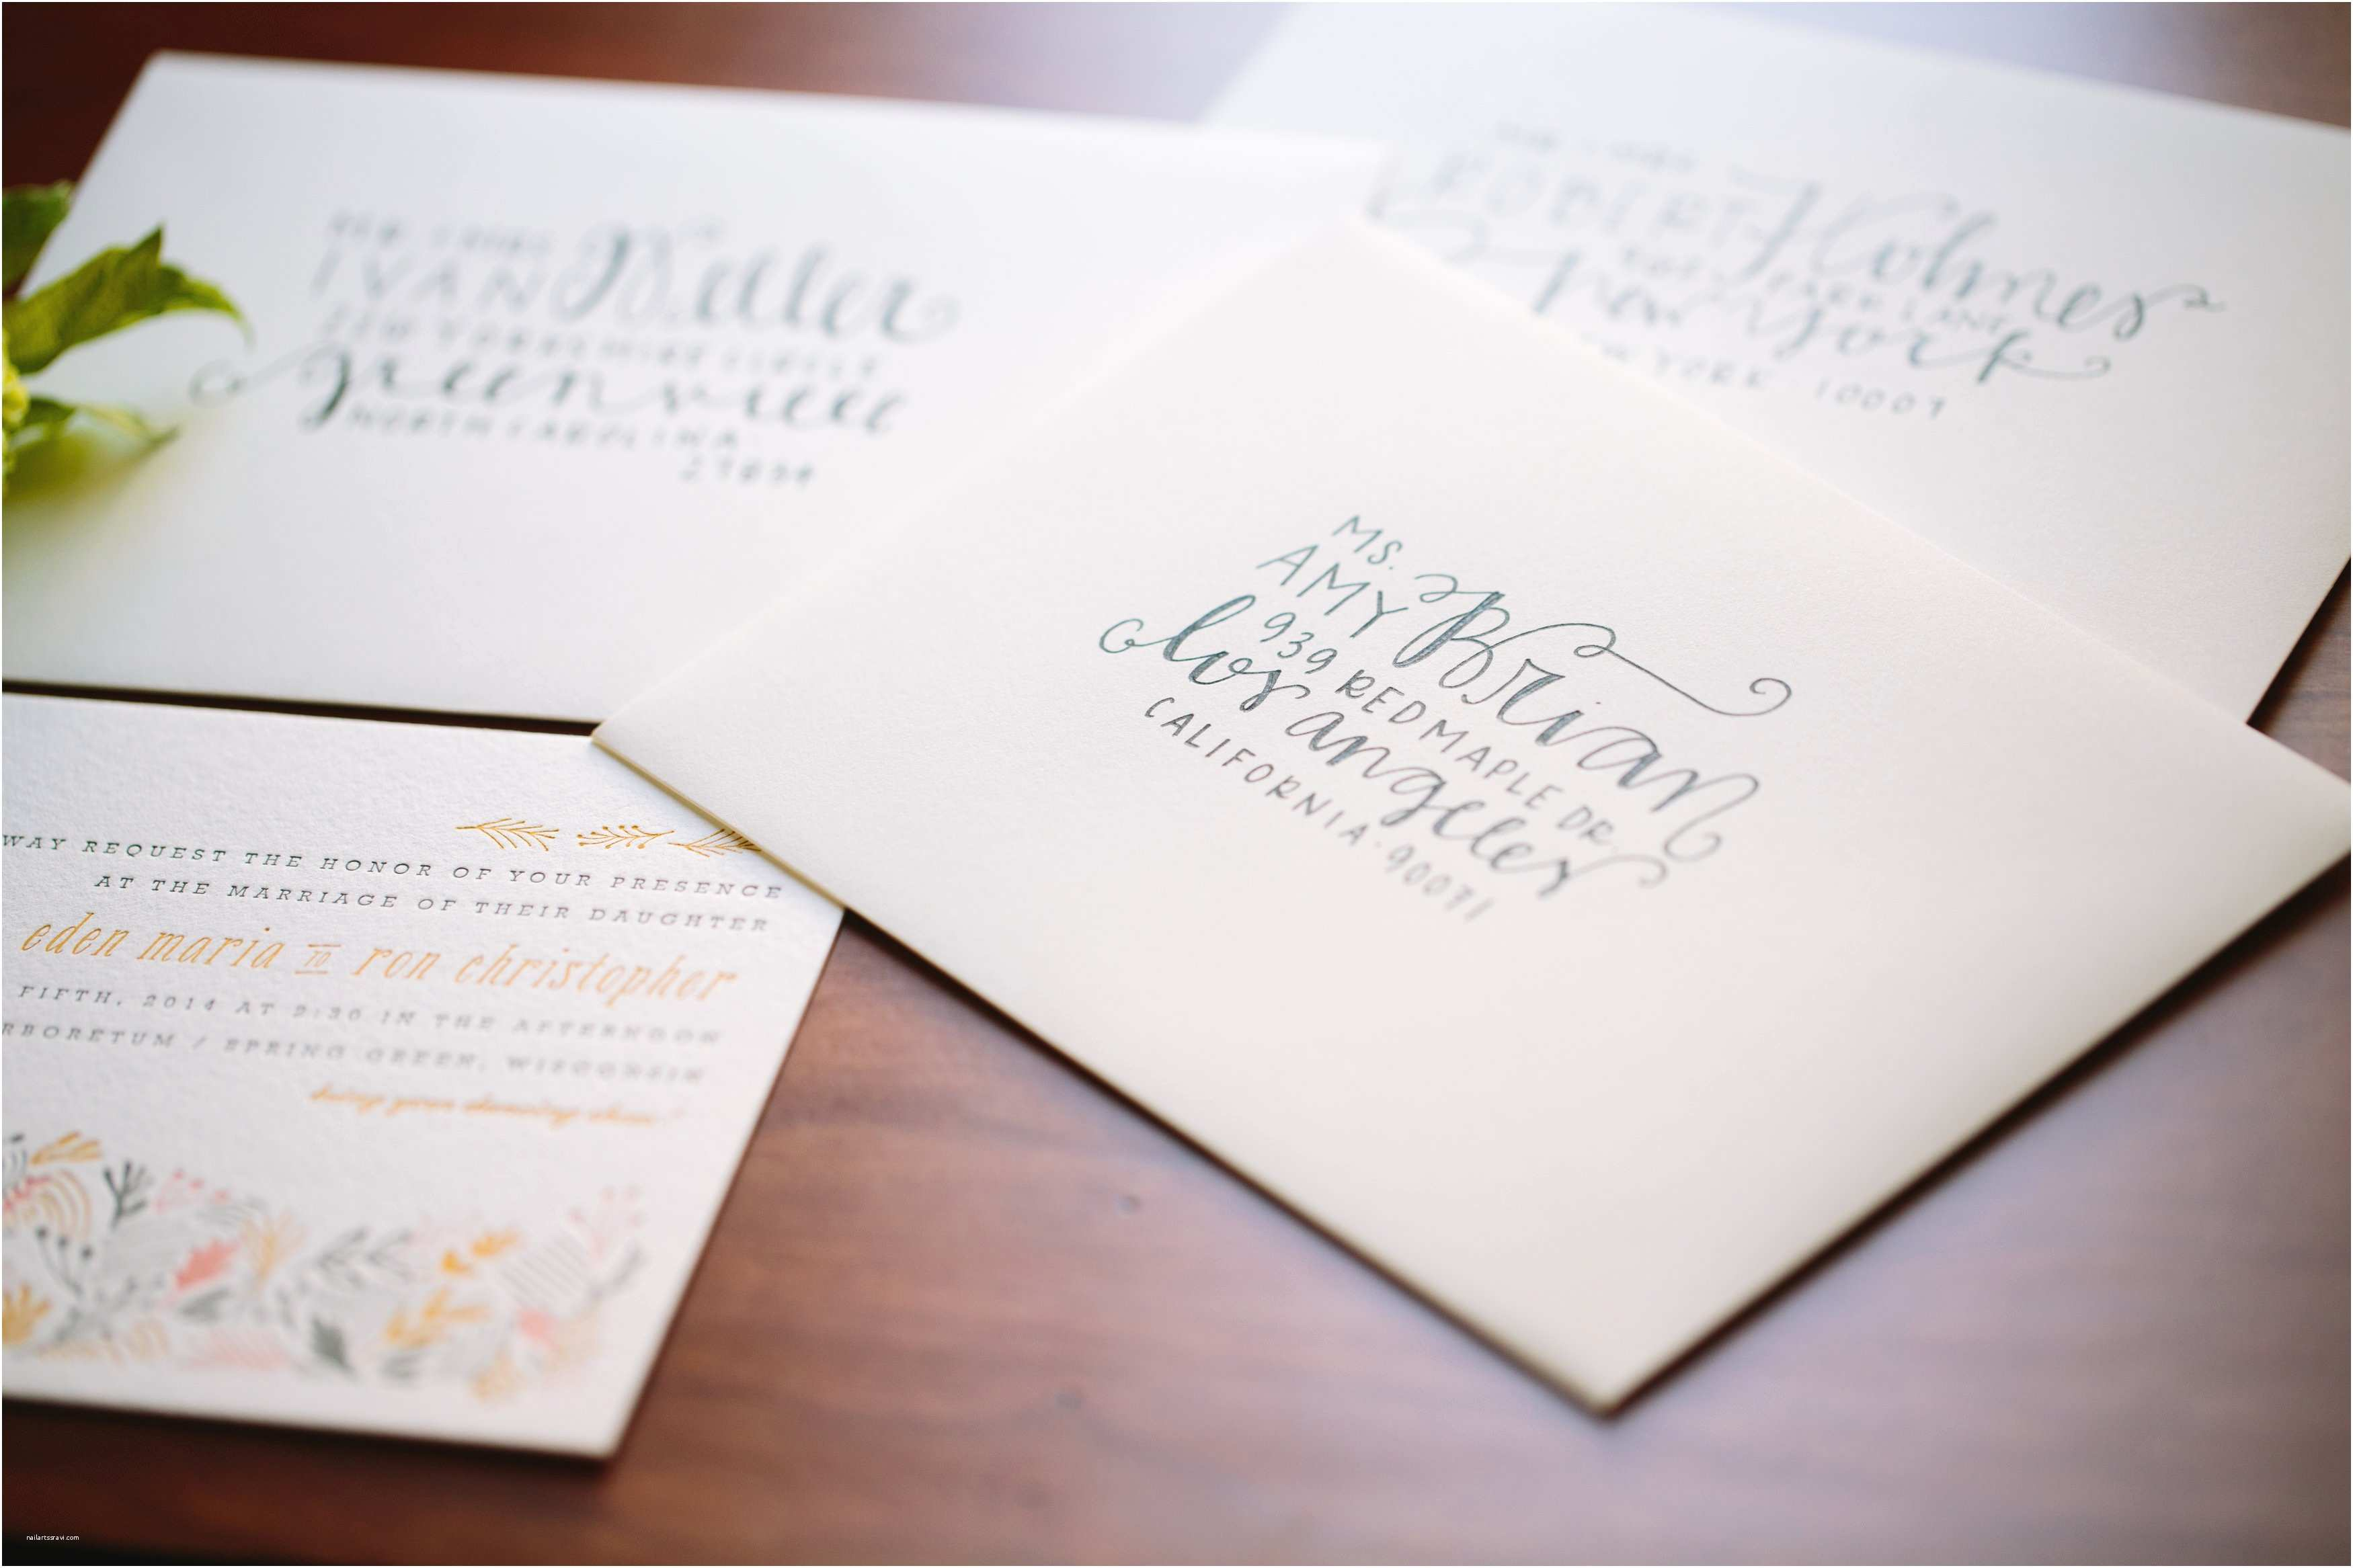 How To Design Wedding Invitations How To Wedding Invitation Address Etiquette Designs